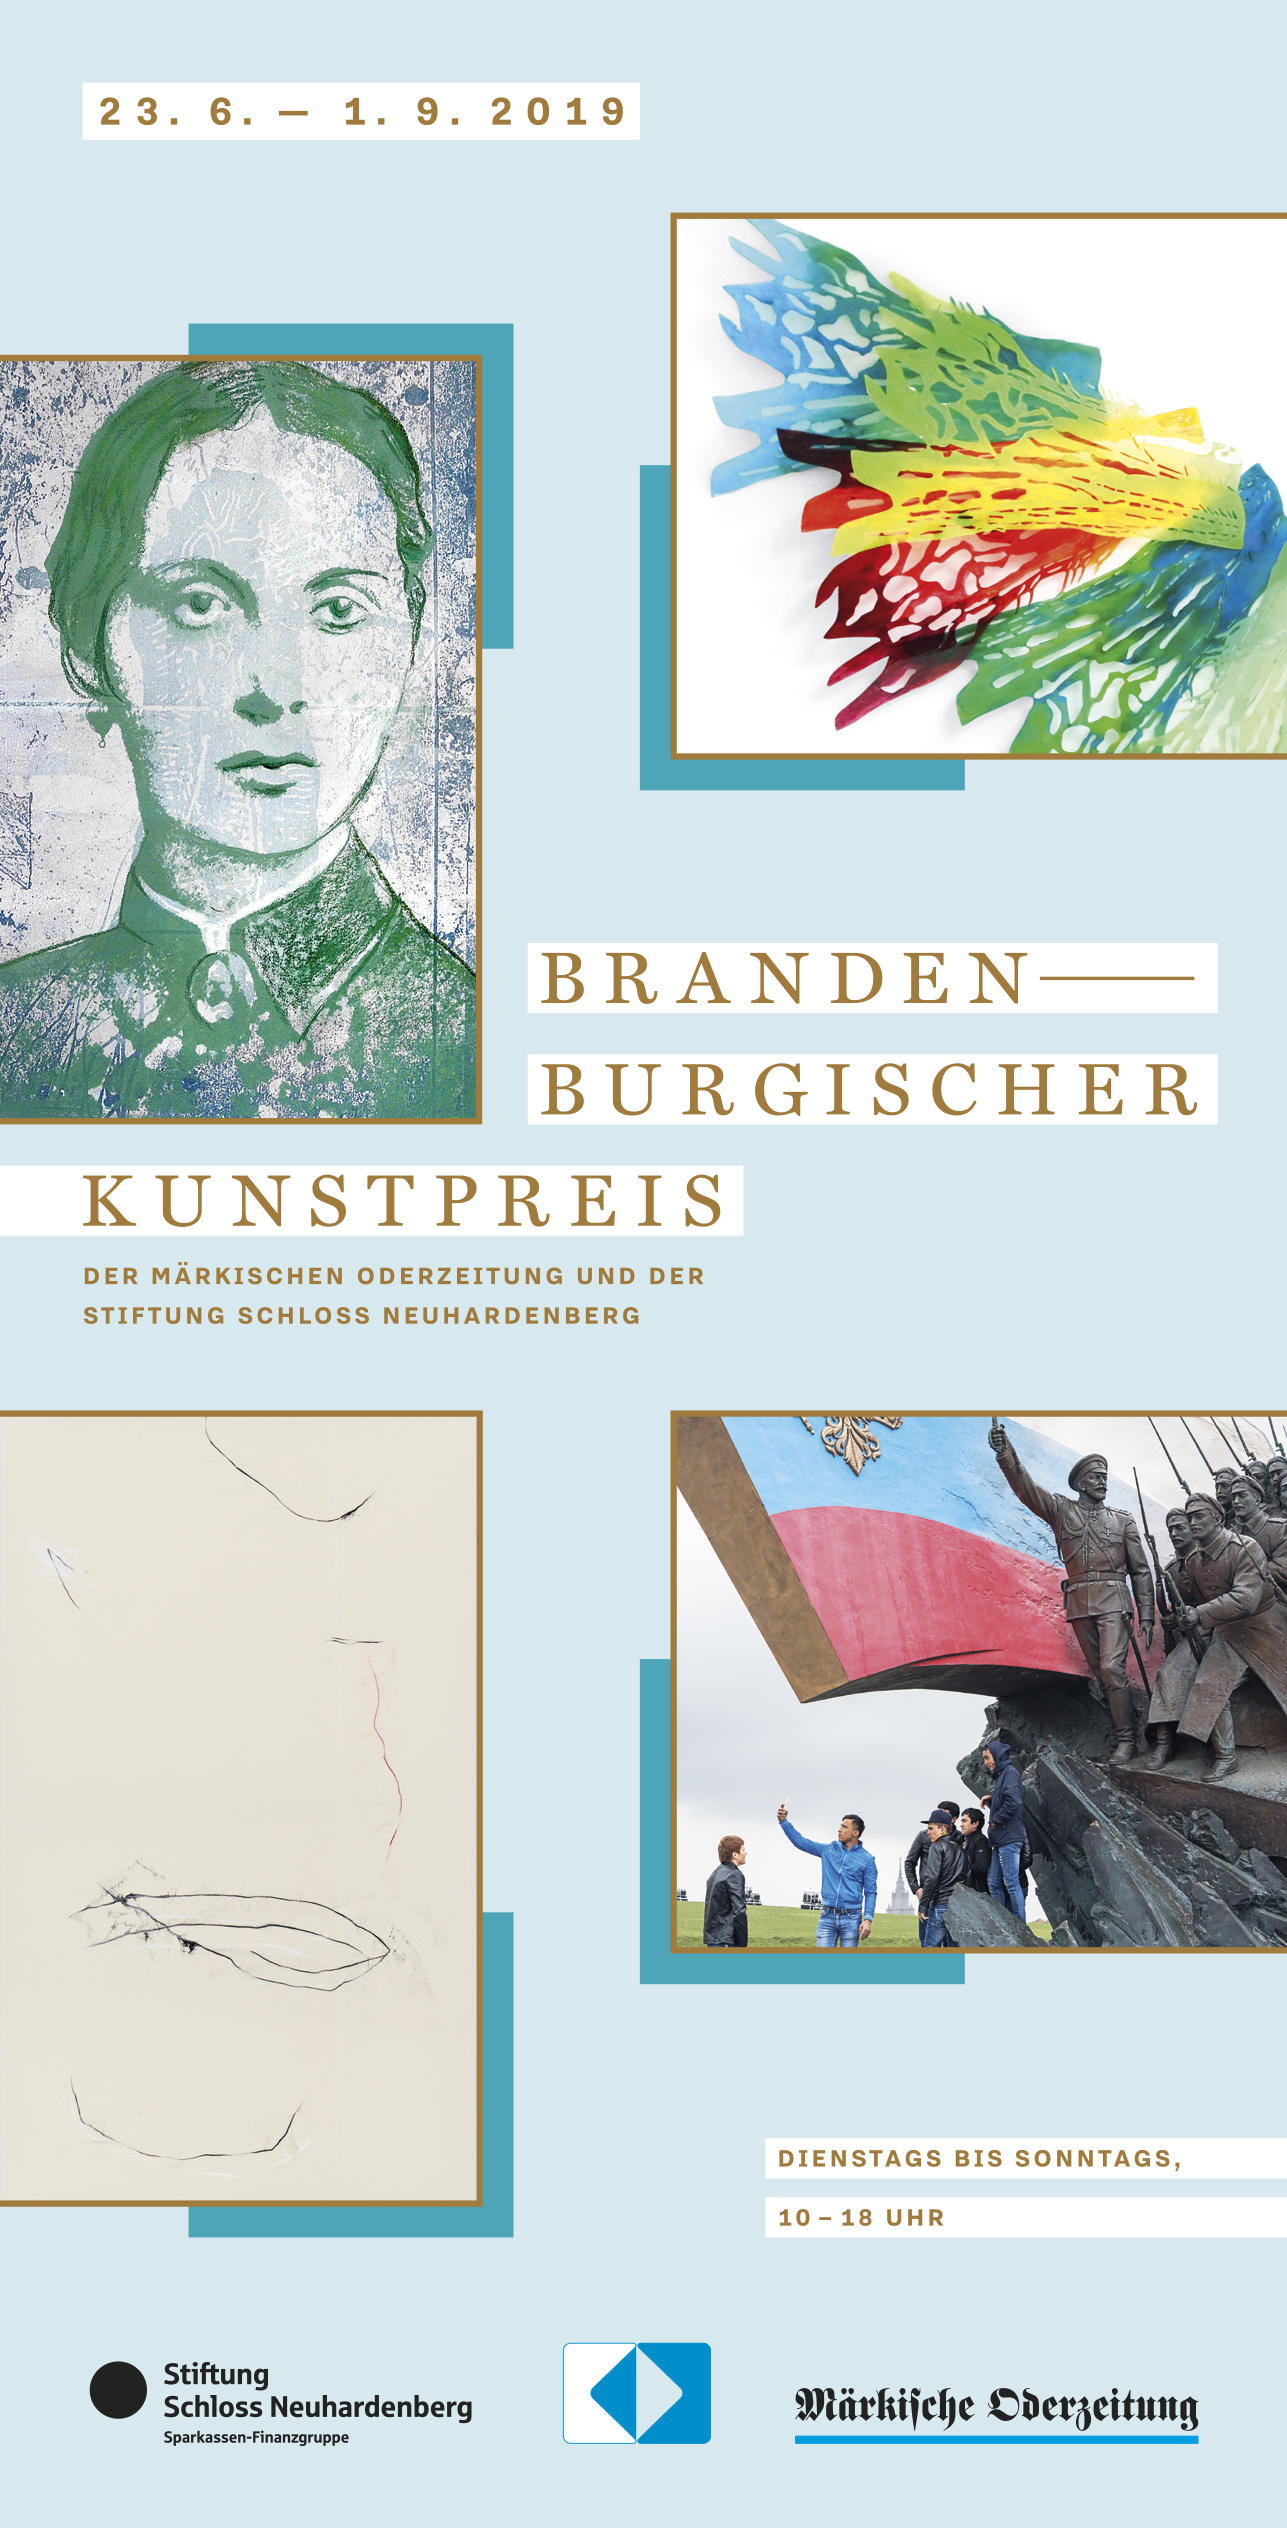 Brandenburgischer Kunstpreis 2019